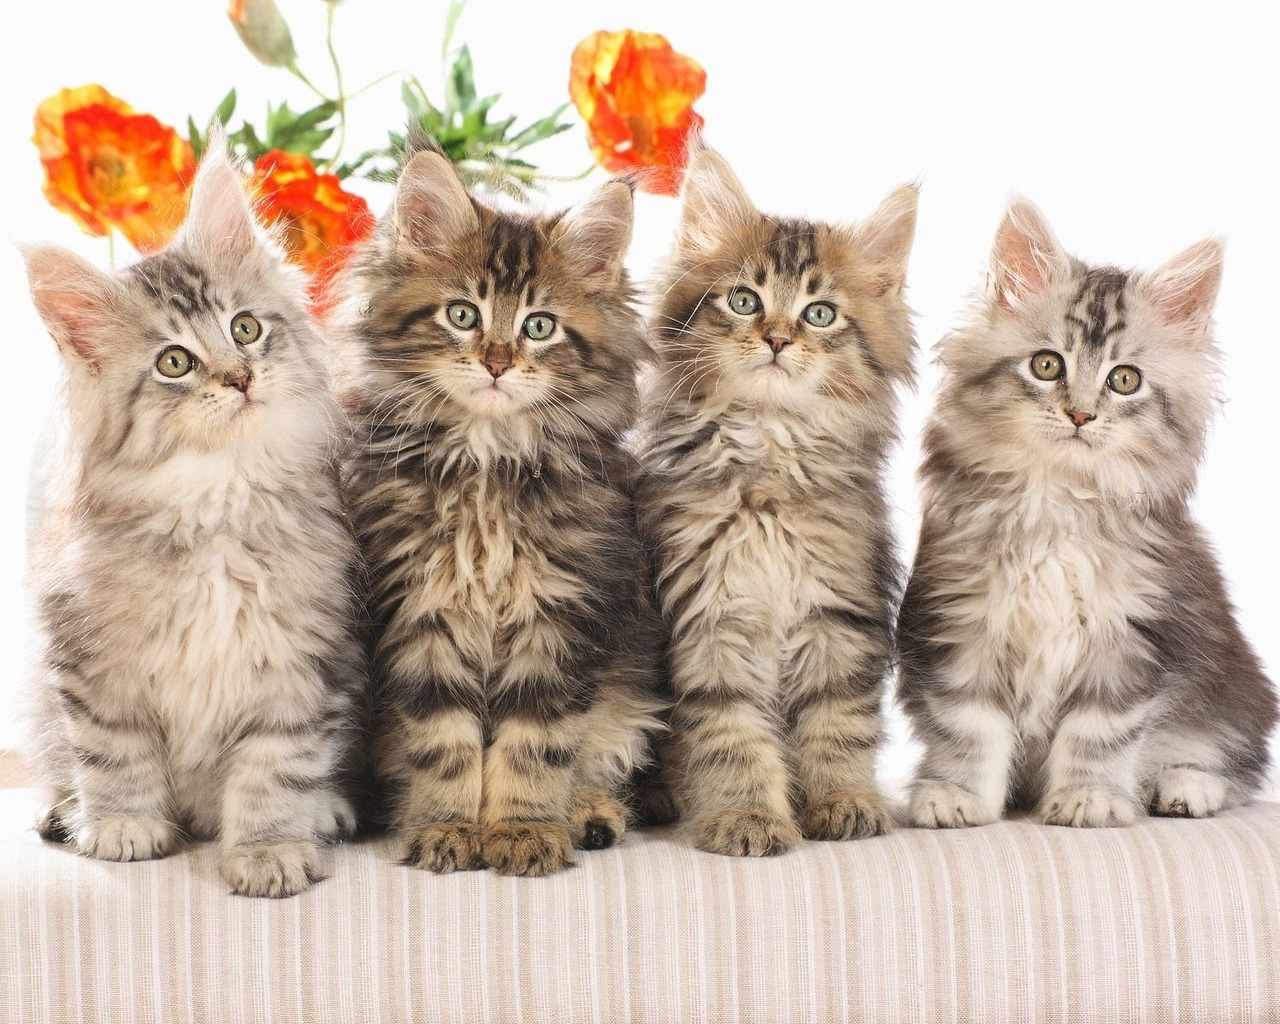 cat wallpaper widescreen for dekstop   cat wallpaper